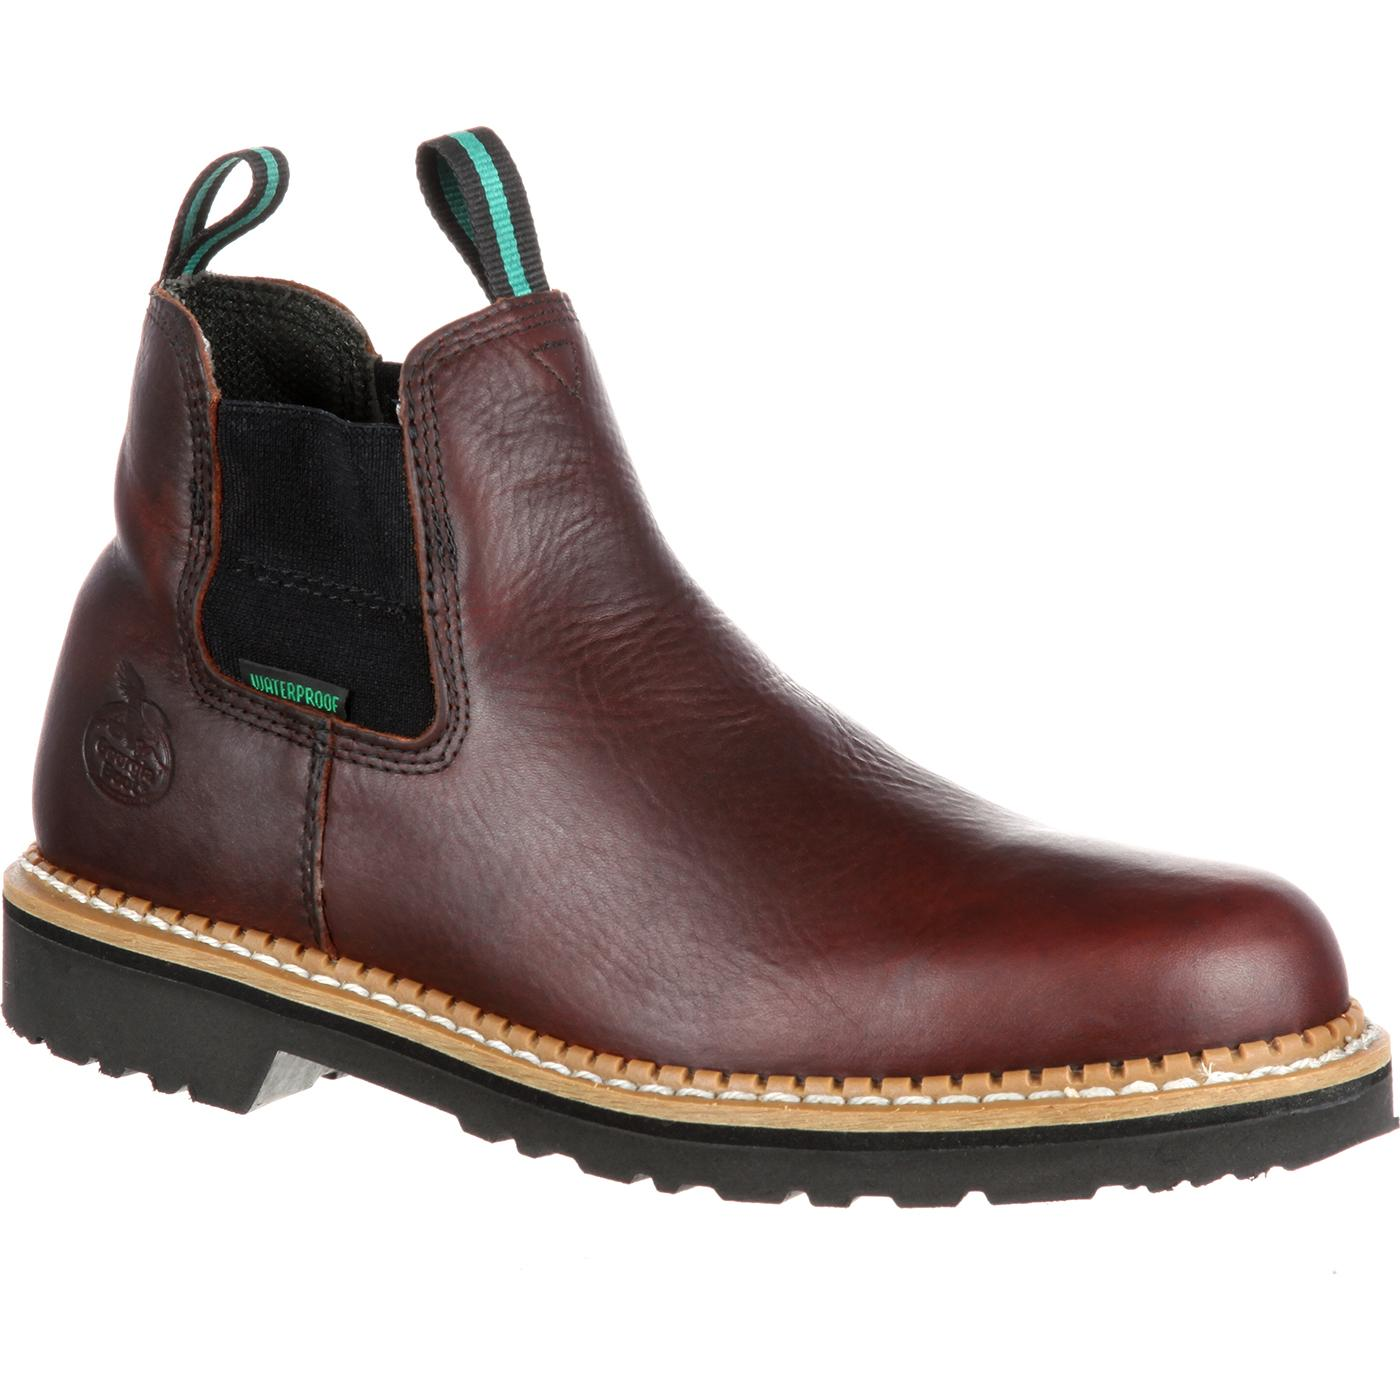 Georgia Boot Waterproof Steel Toe Romeo Boots, style #GR530